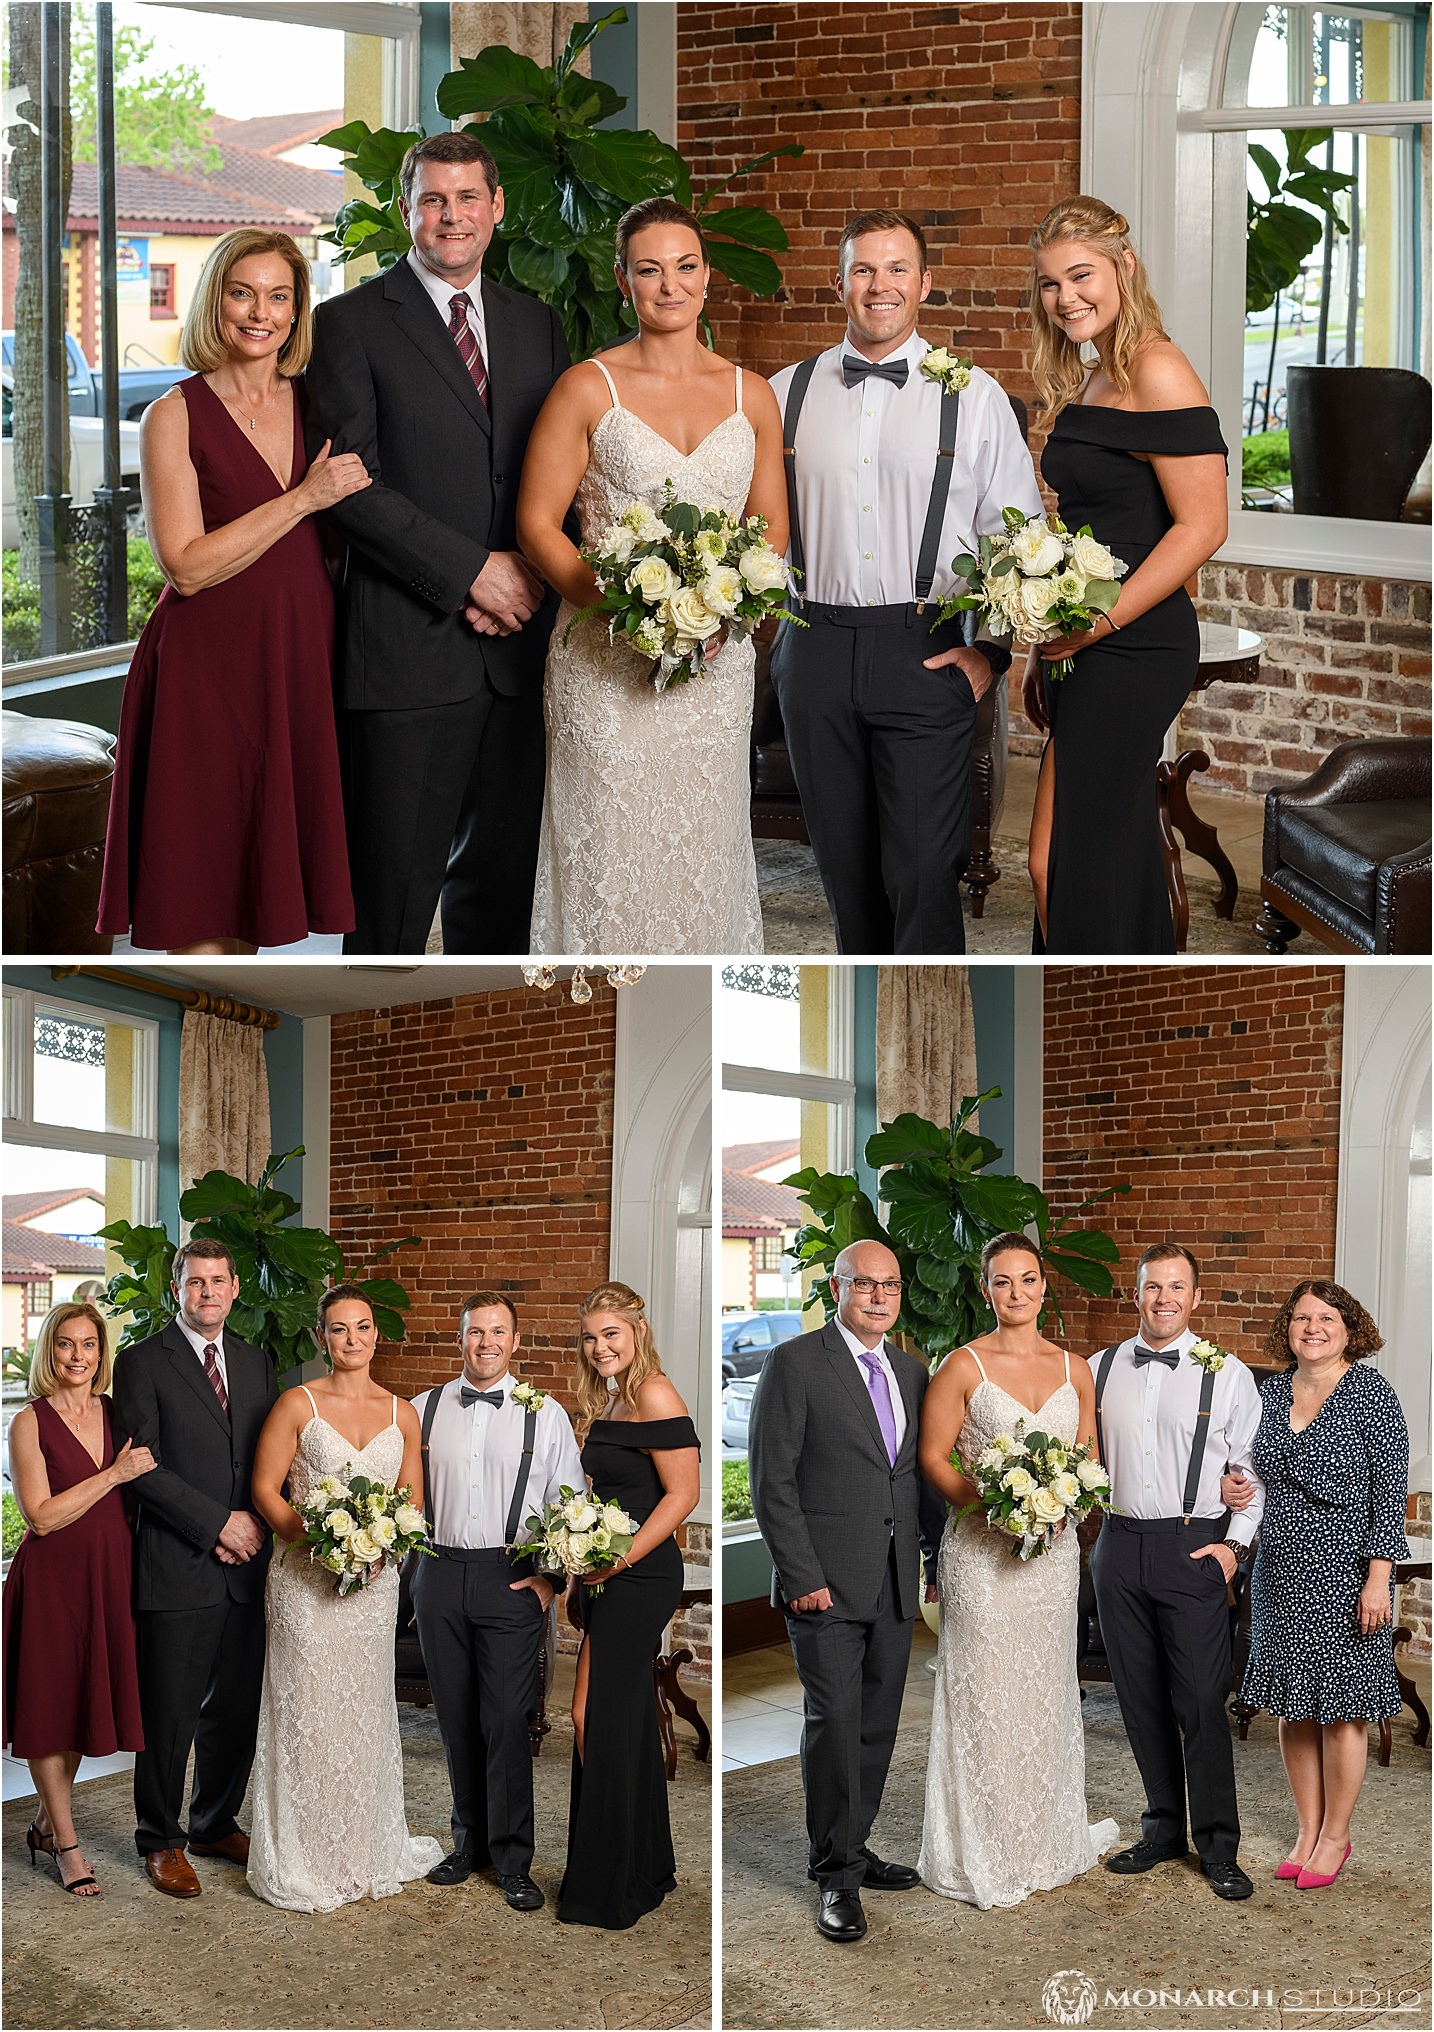 085-whiteroom-wedding-photographer-2019-05-22_0067.jpg